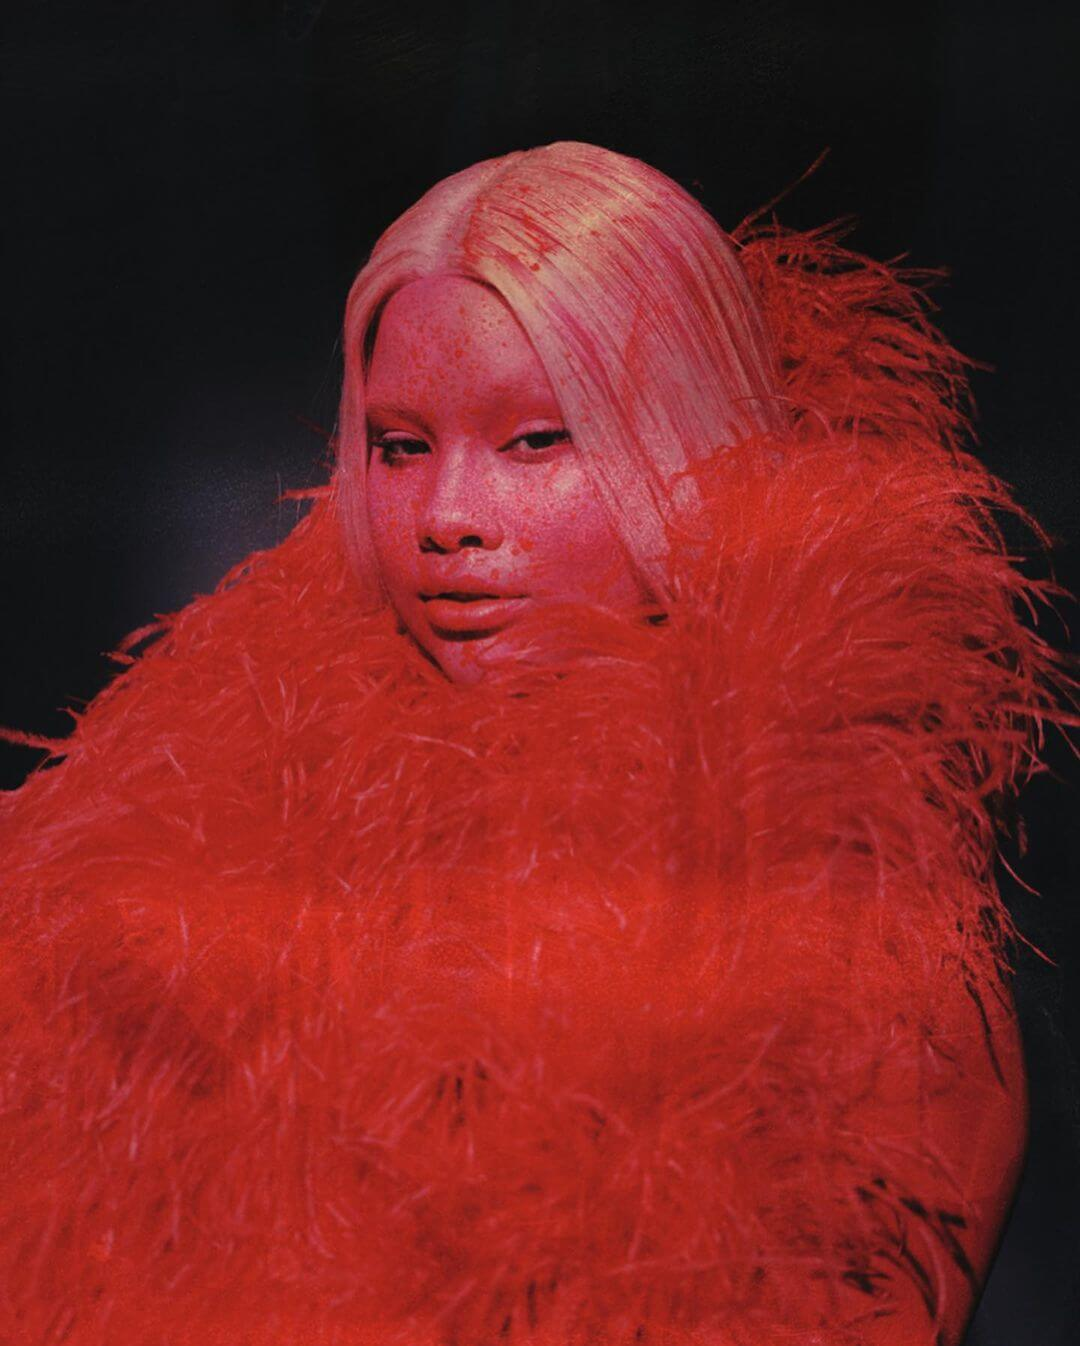 MOR.BO RIOT: Shygirl, la rapera londinense que rompe tabúes con beats experimentales